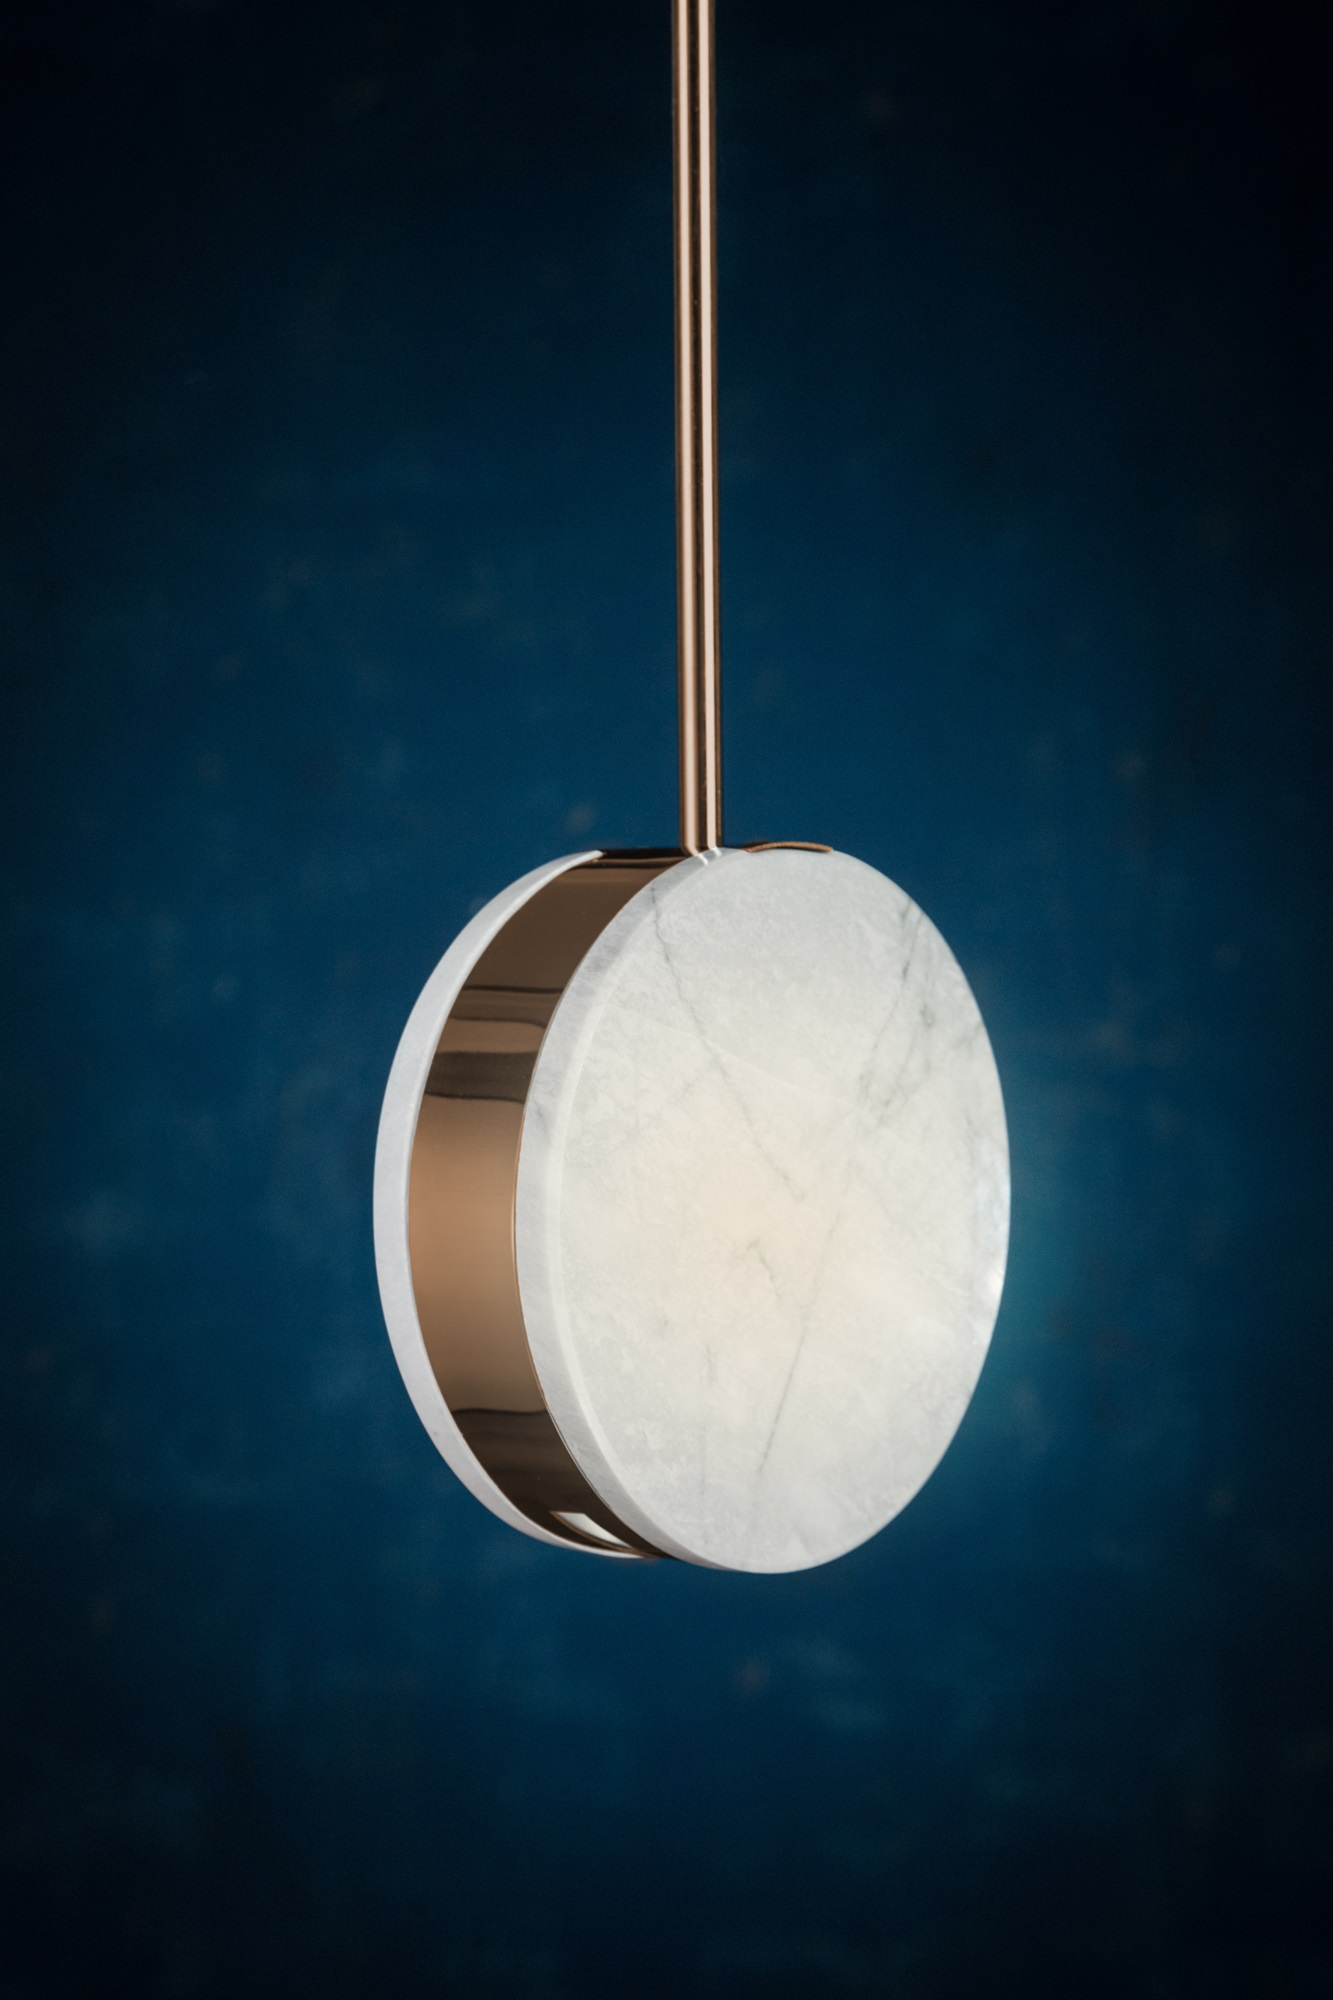 skeld-design-crios-copper-02.jpg